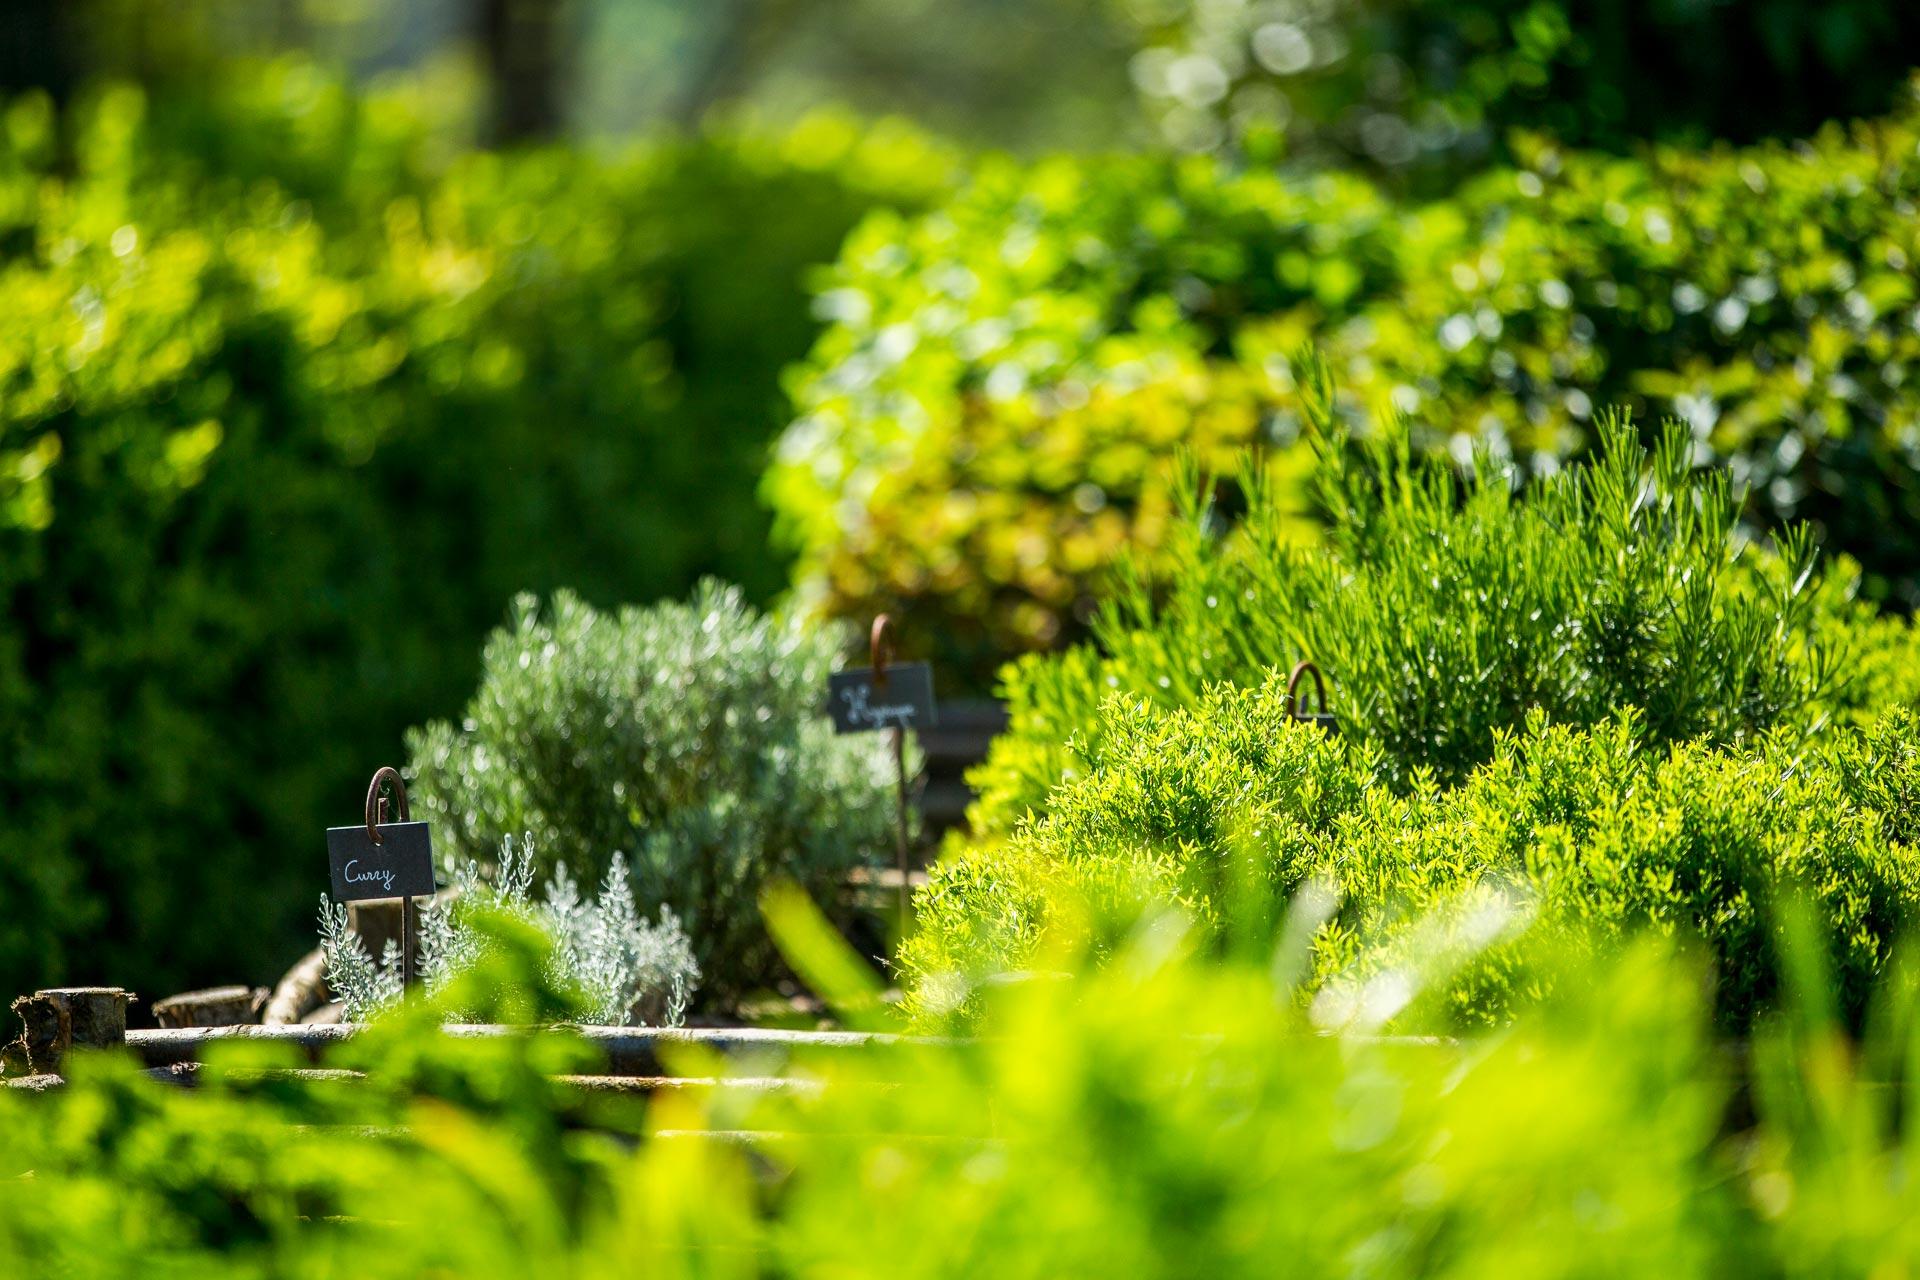 Herbes aromatiques : thym, estragon, basilic